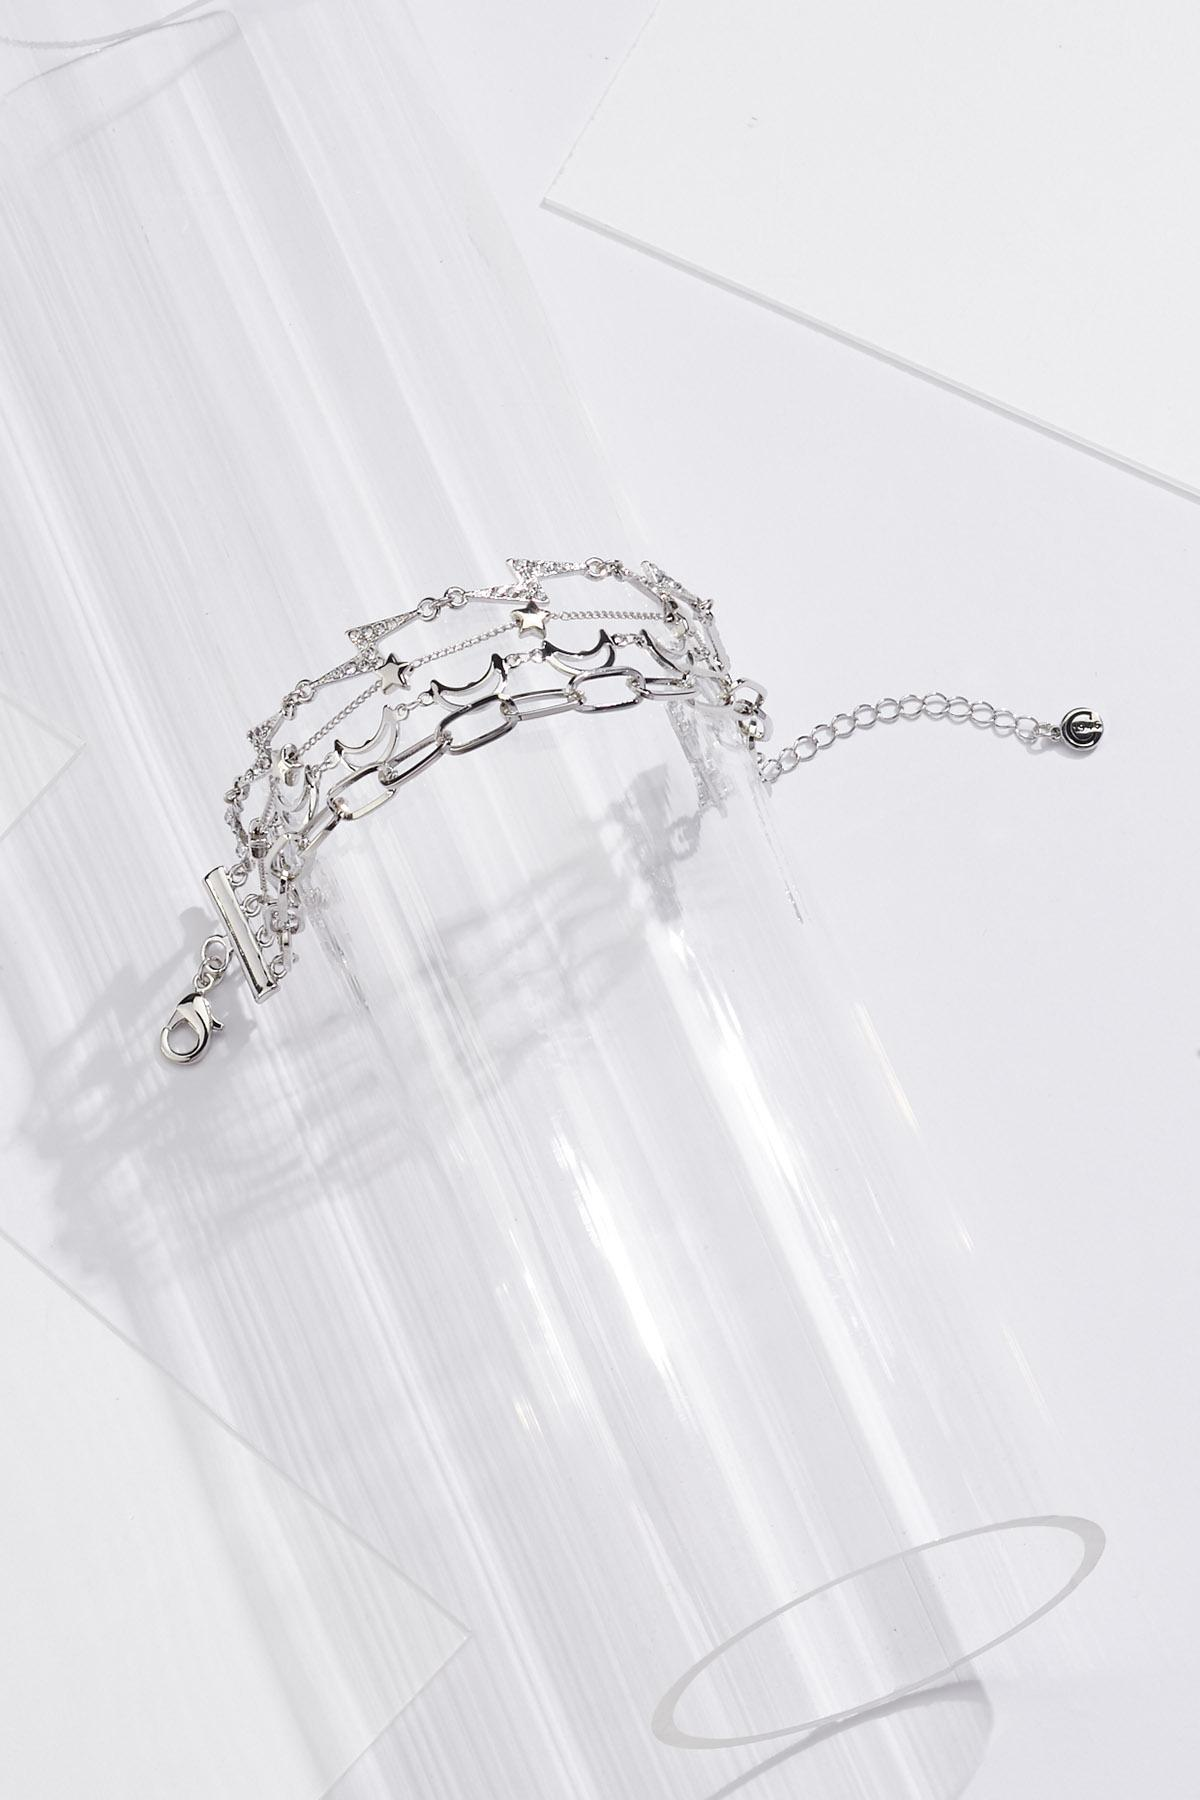 Celestial Metal Bracelet